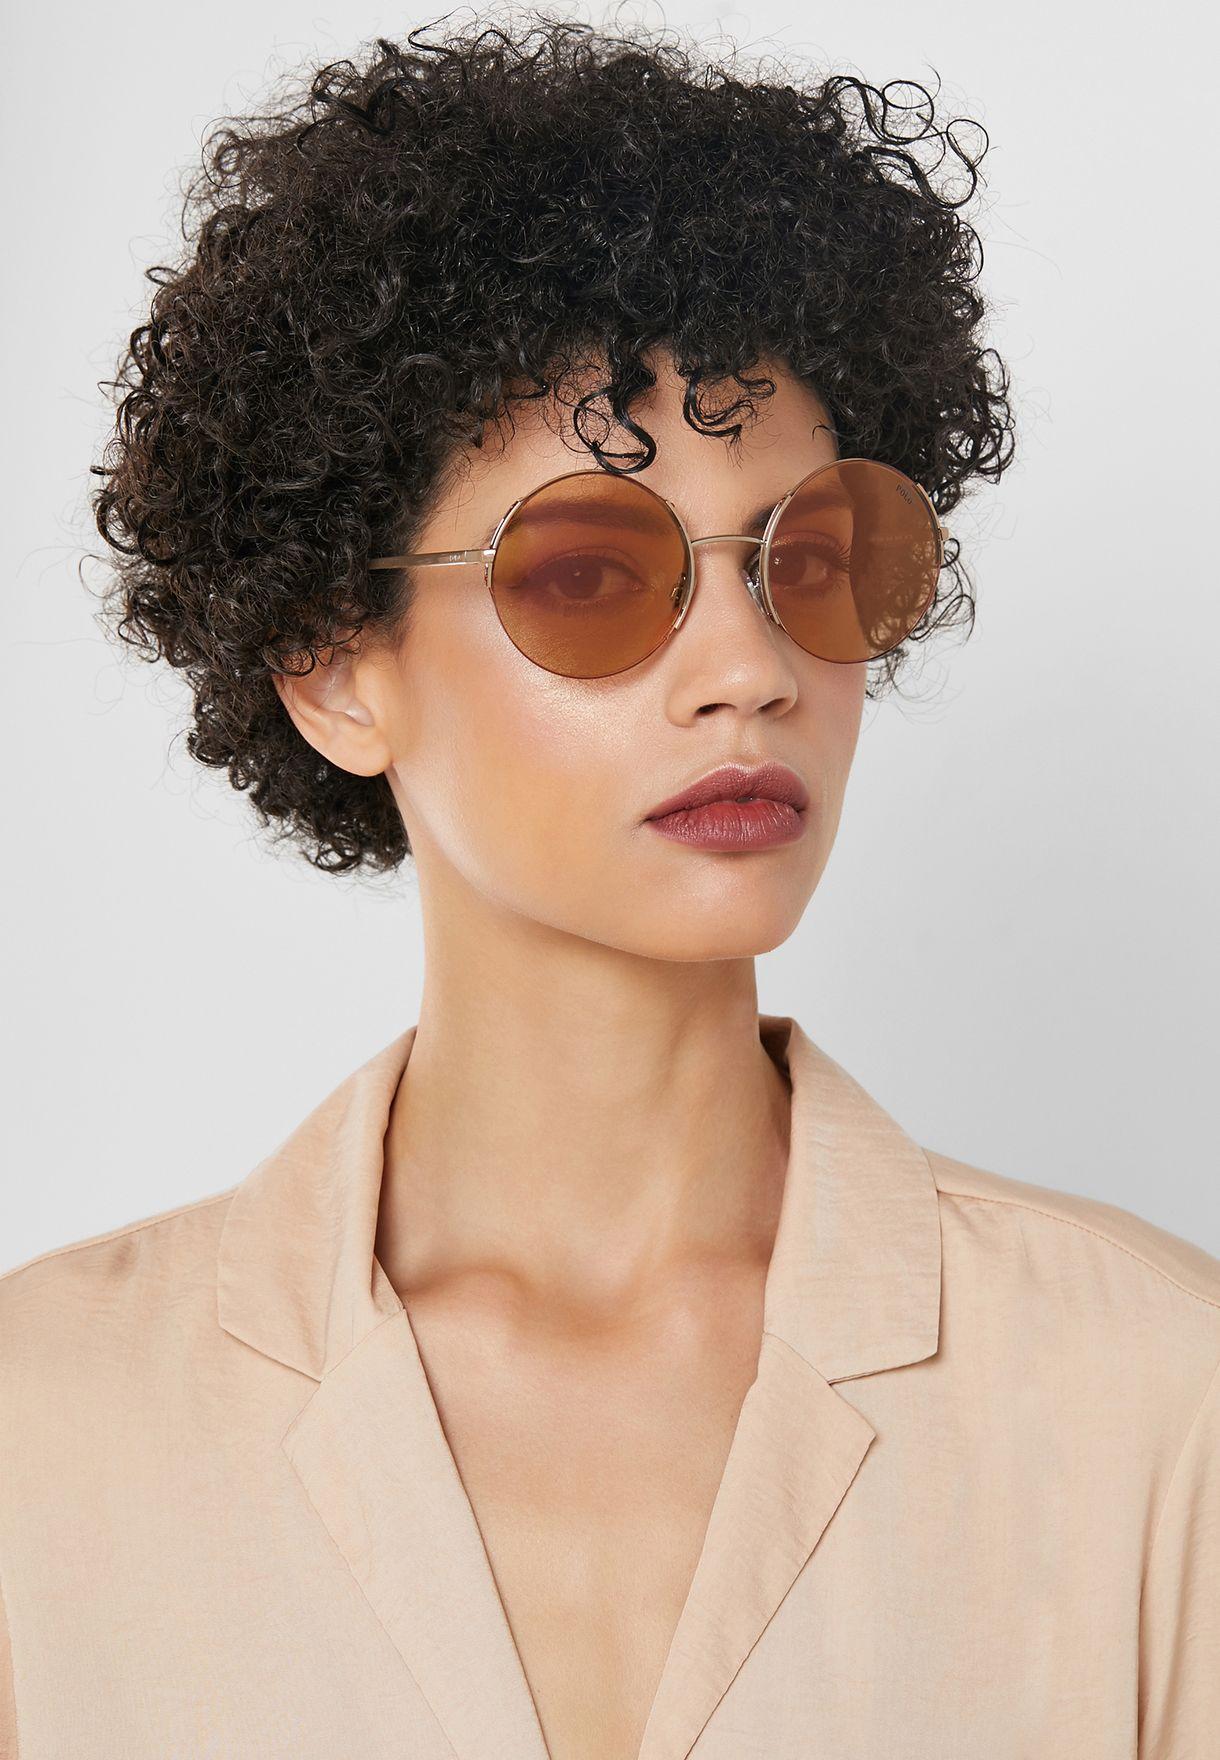 4e463ff0d98 Shop Polo Ralph Lauren gold Round Sunglasses 8.05E+12 for ...